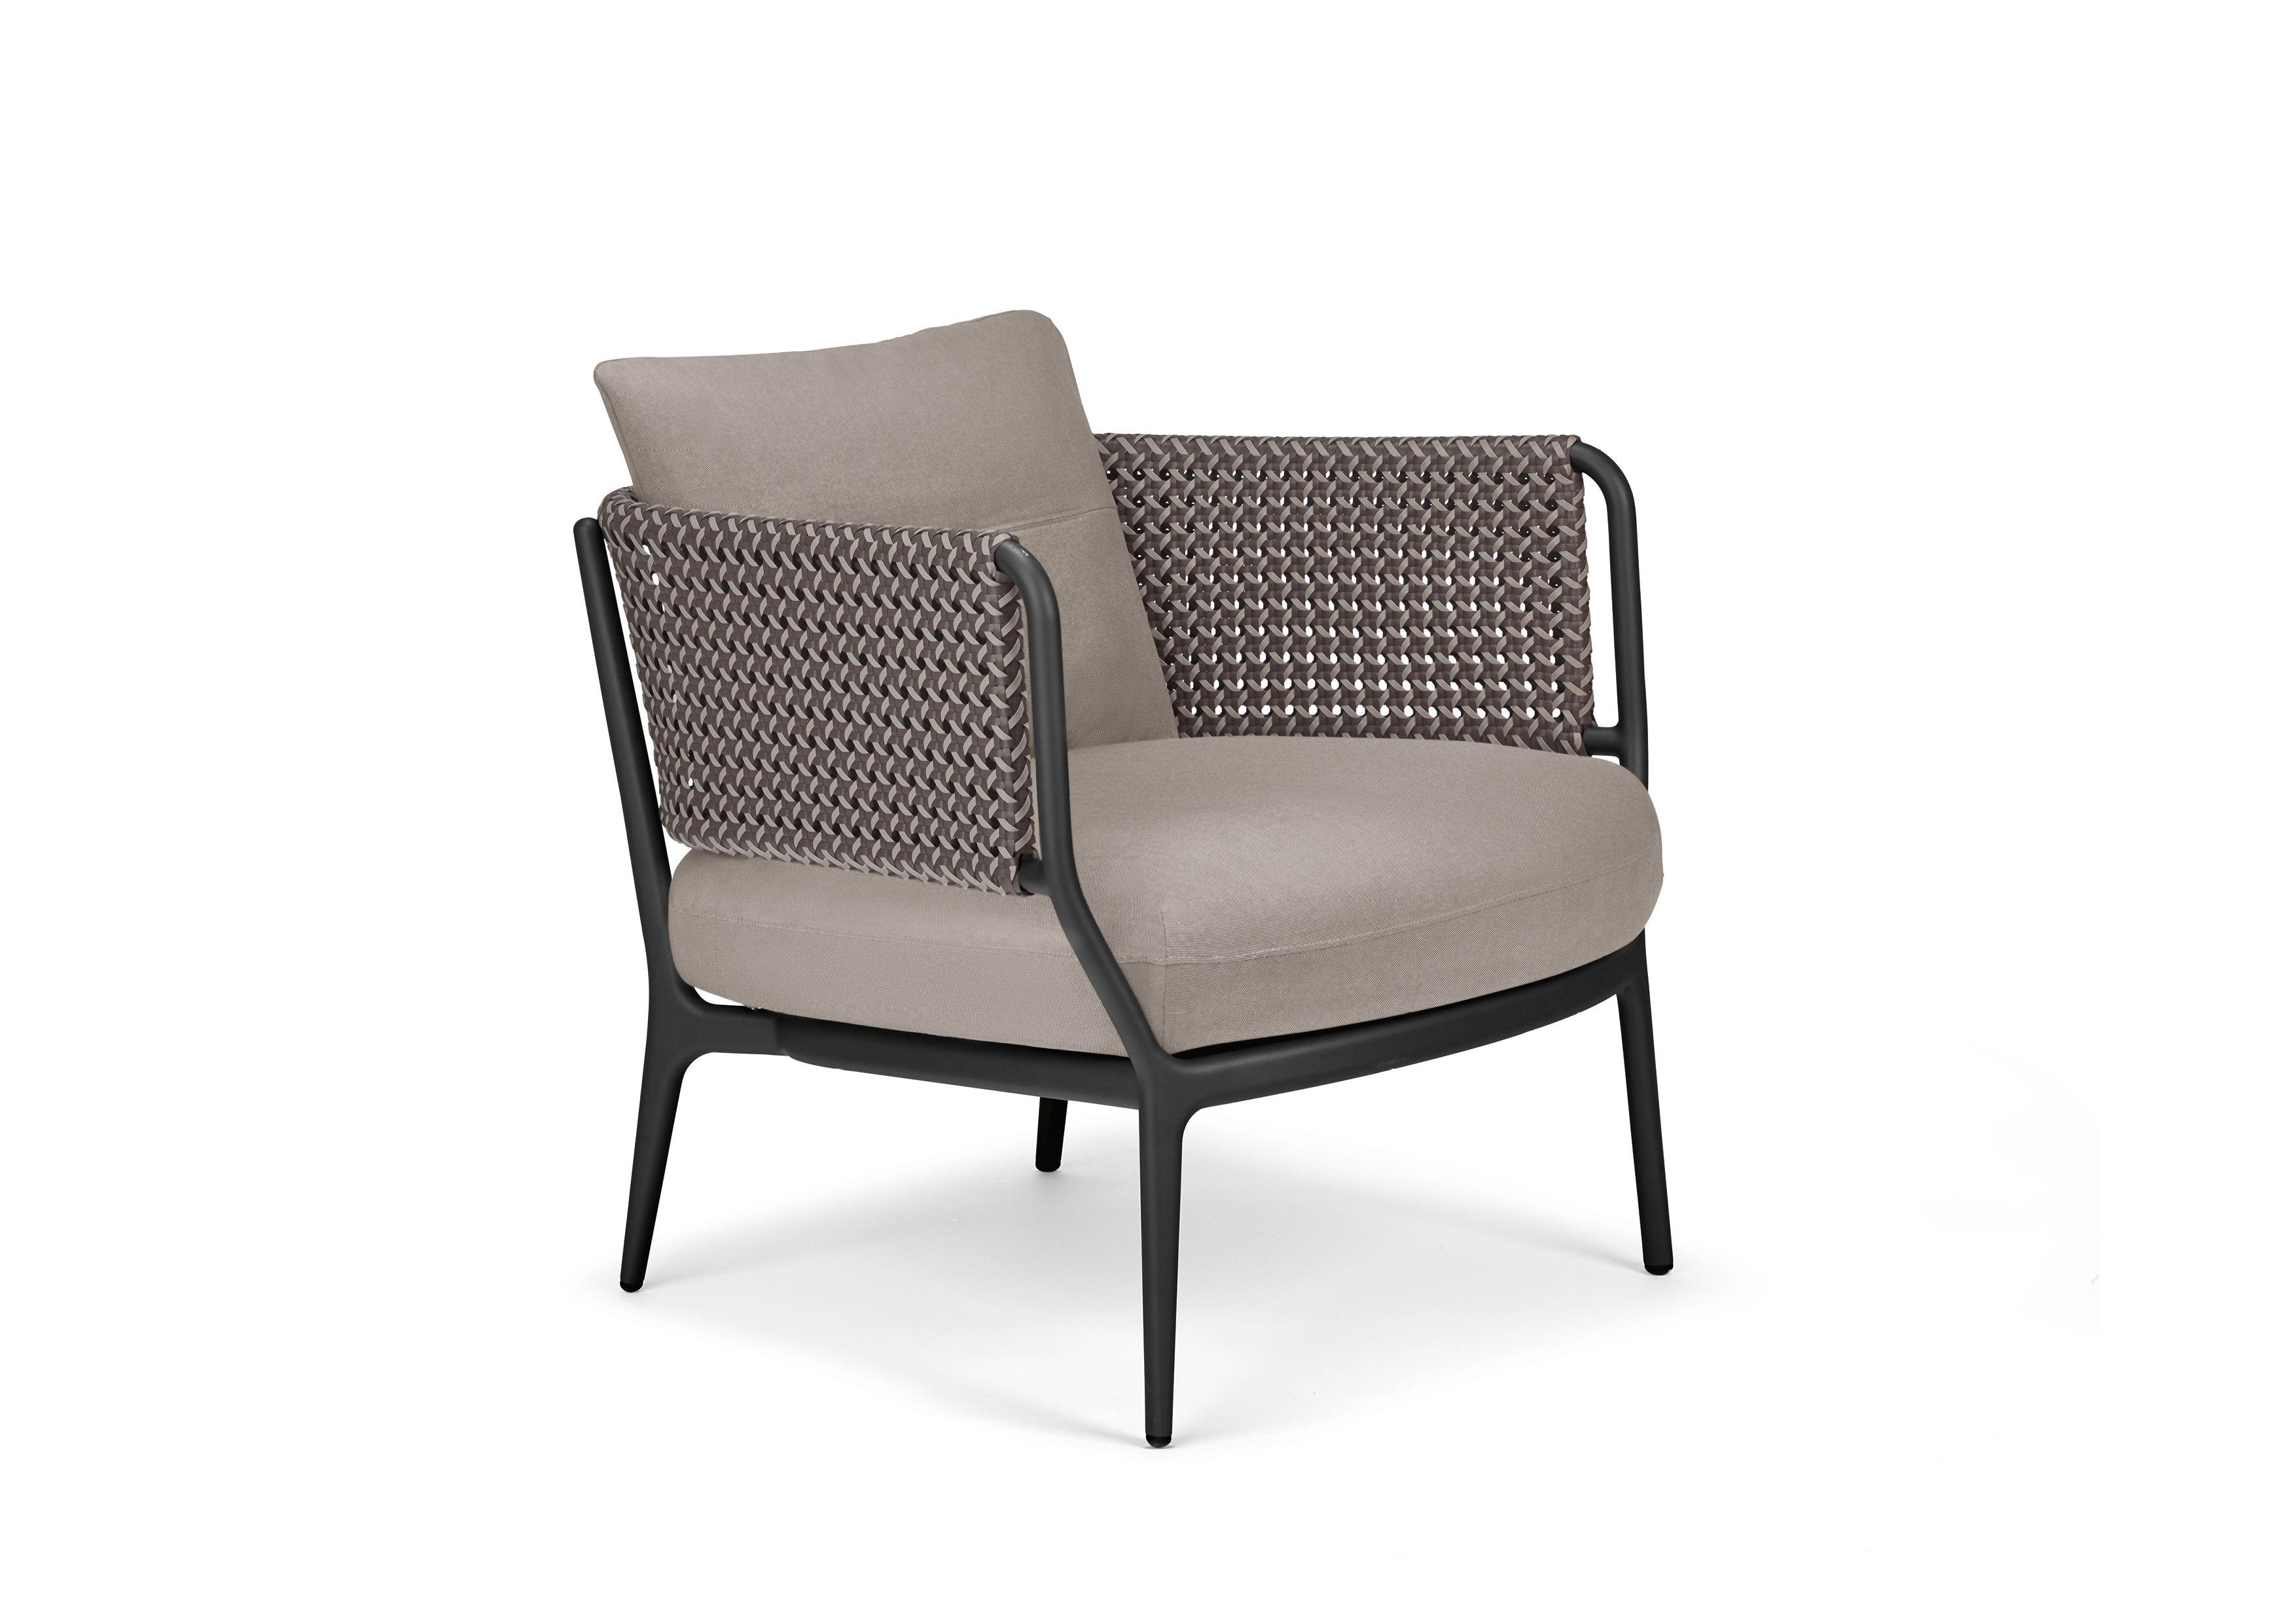 Garden Armchair With Armrests Bellmonde By Dedon Design Henrik Pedersen